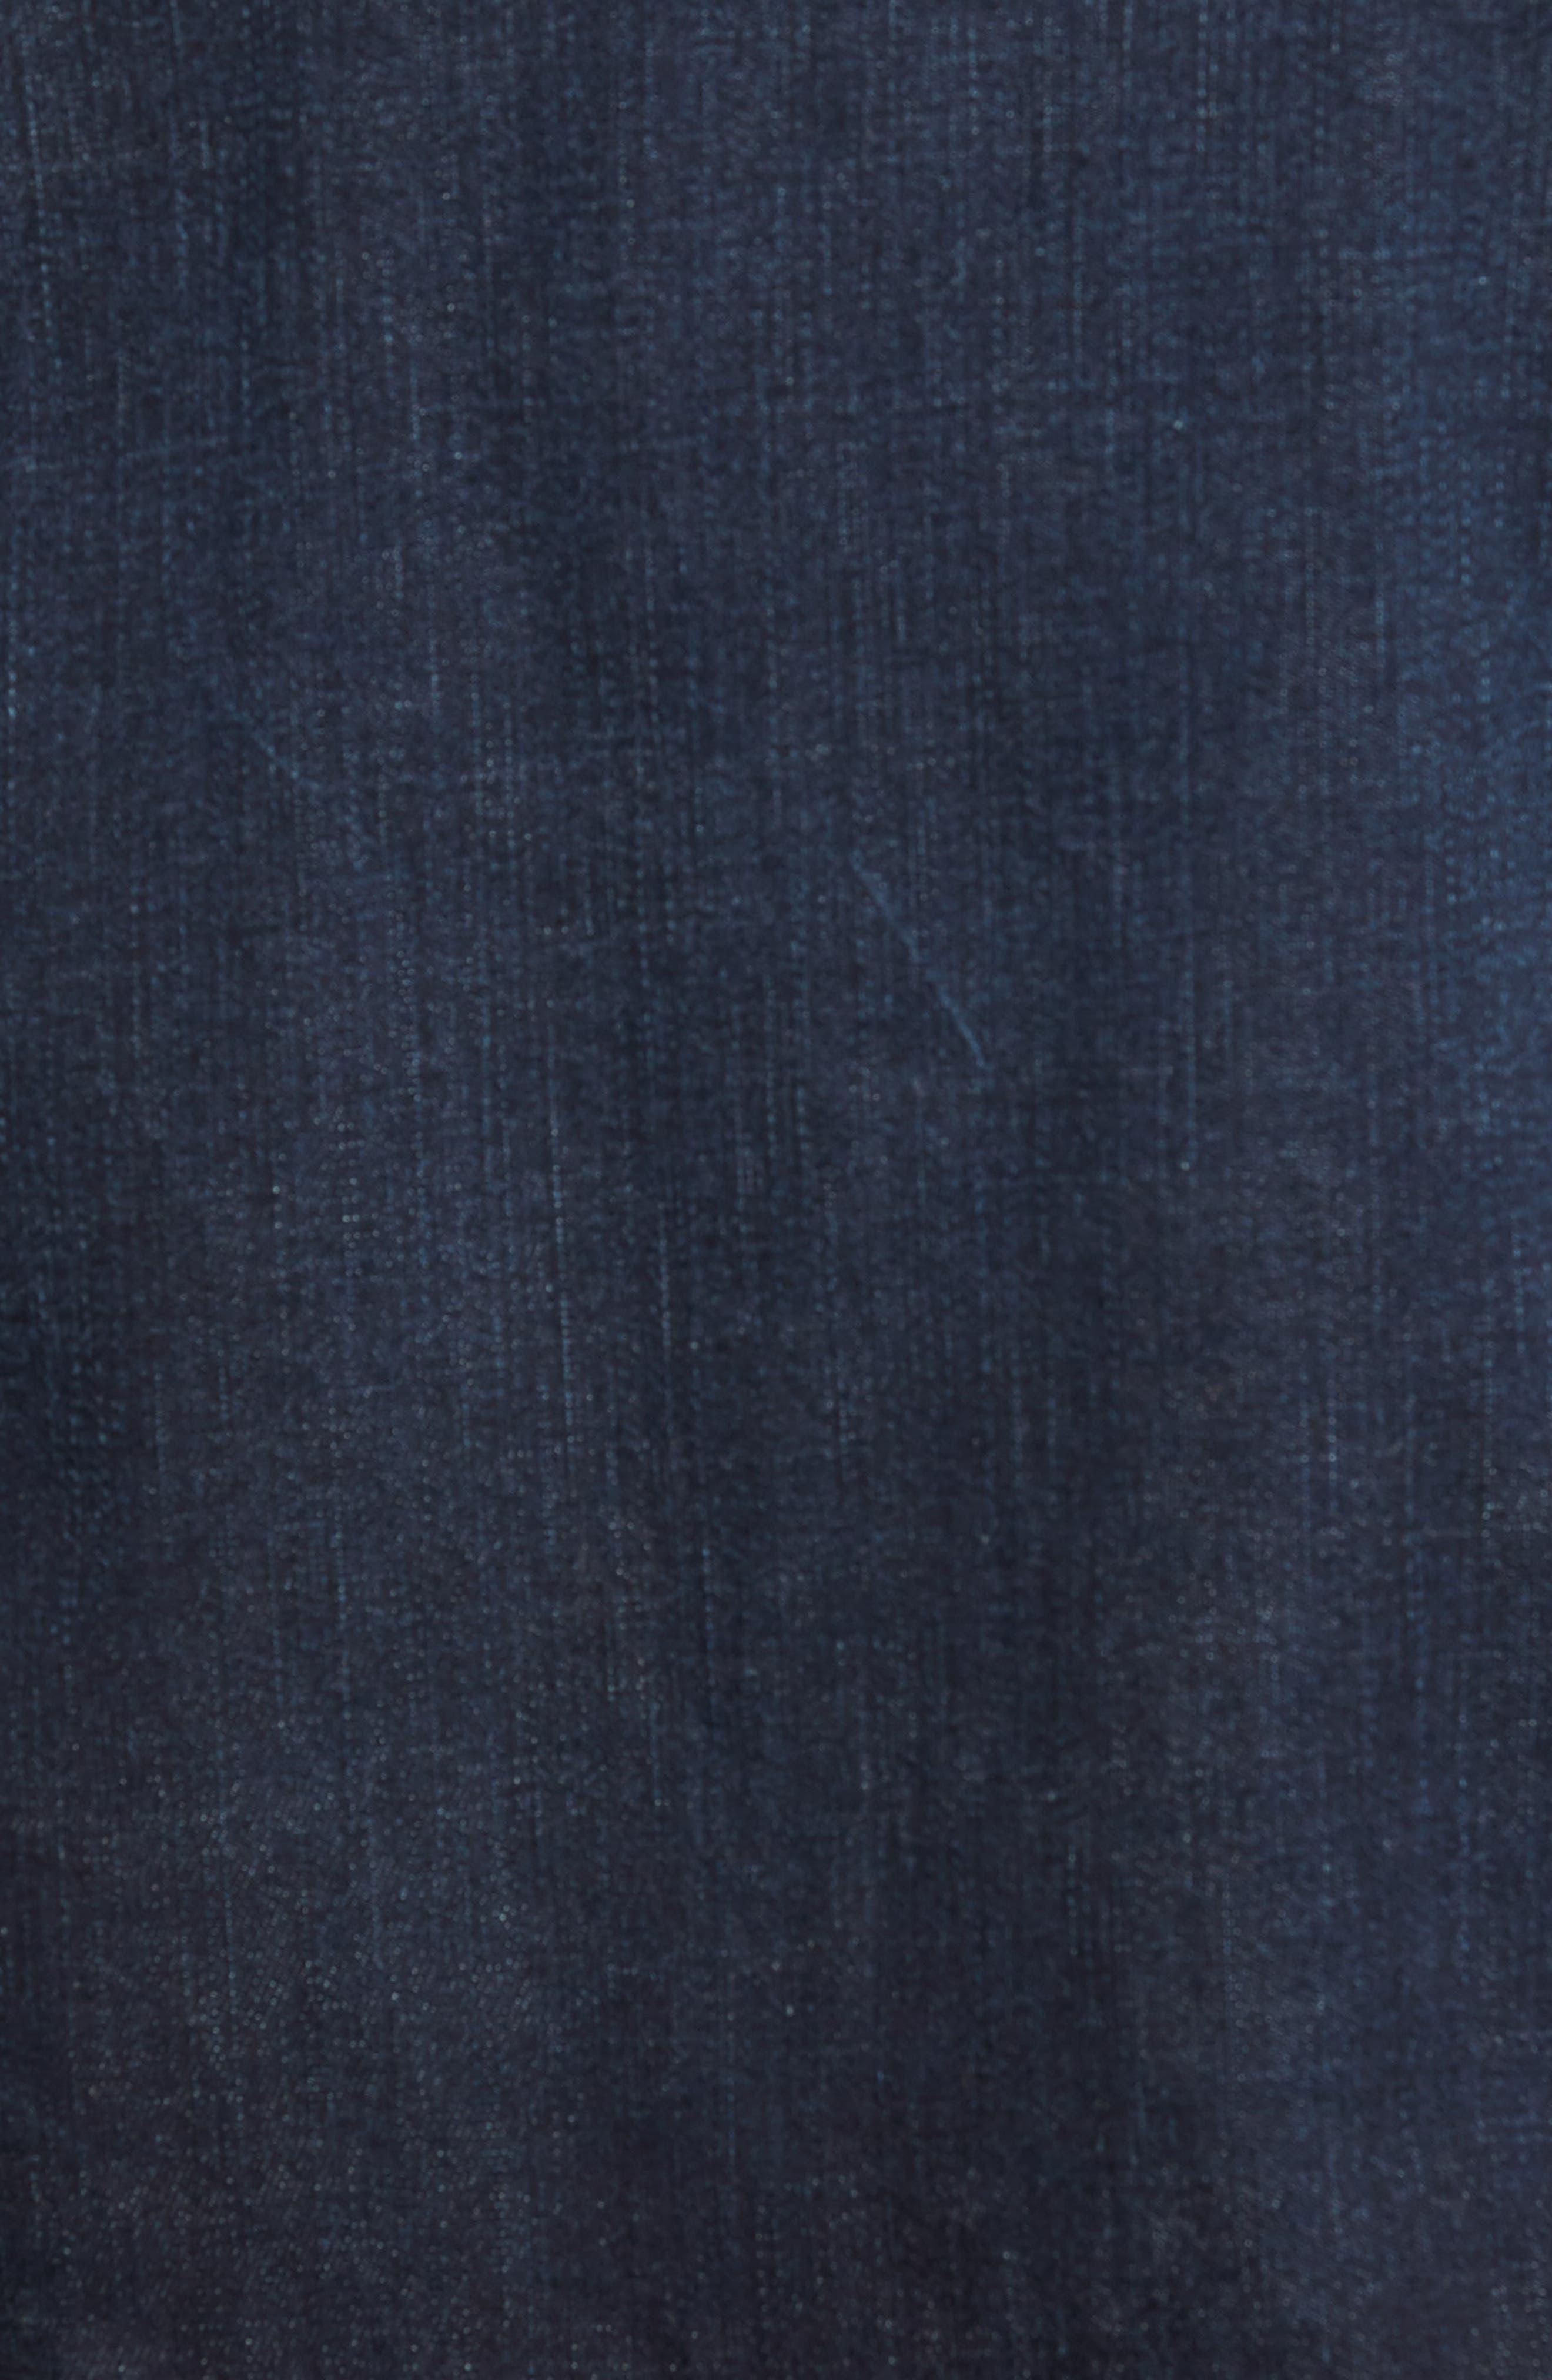 Rogue Denim Jacket,                             Alternate thumbnail 6, color,                             406